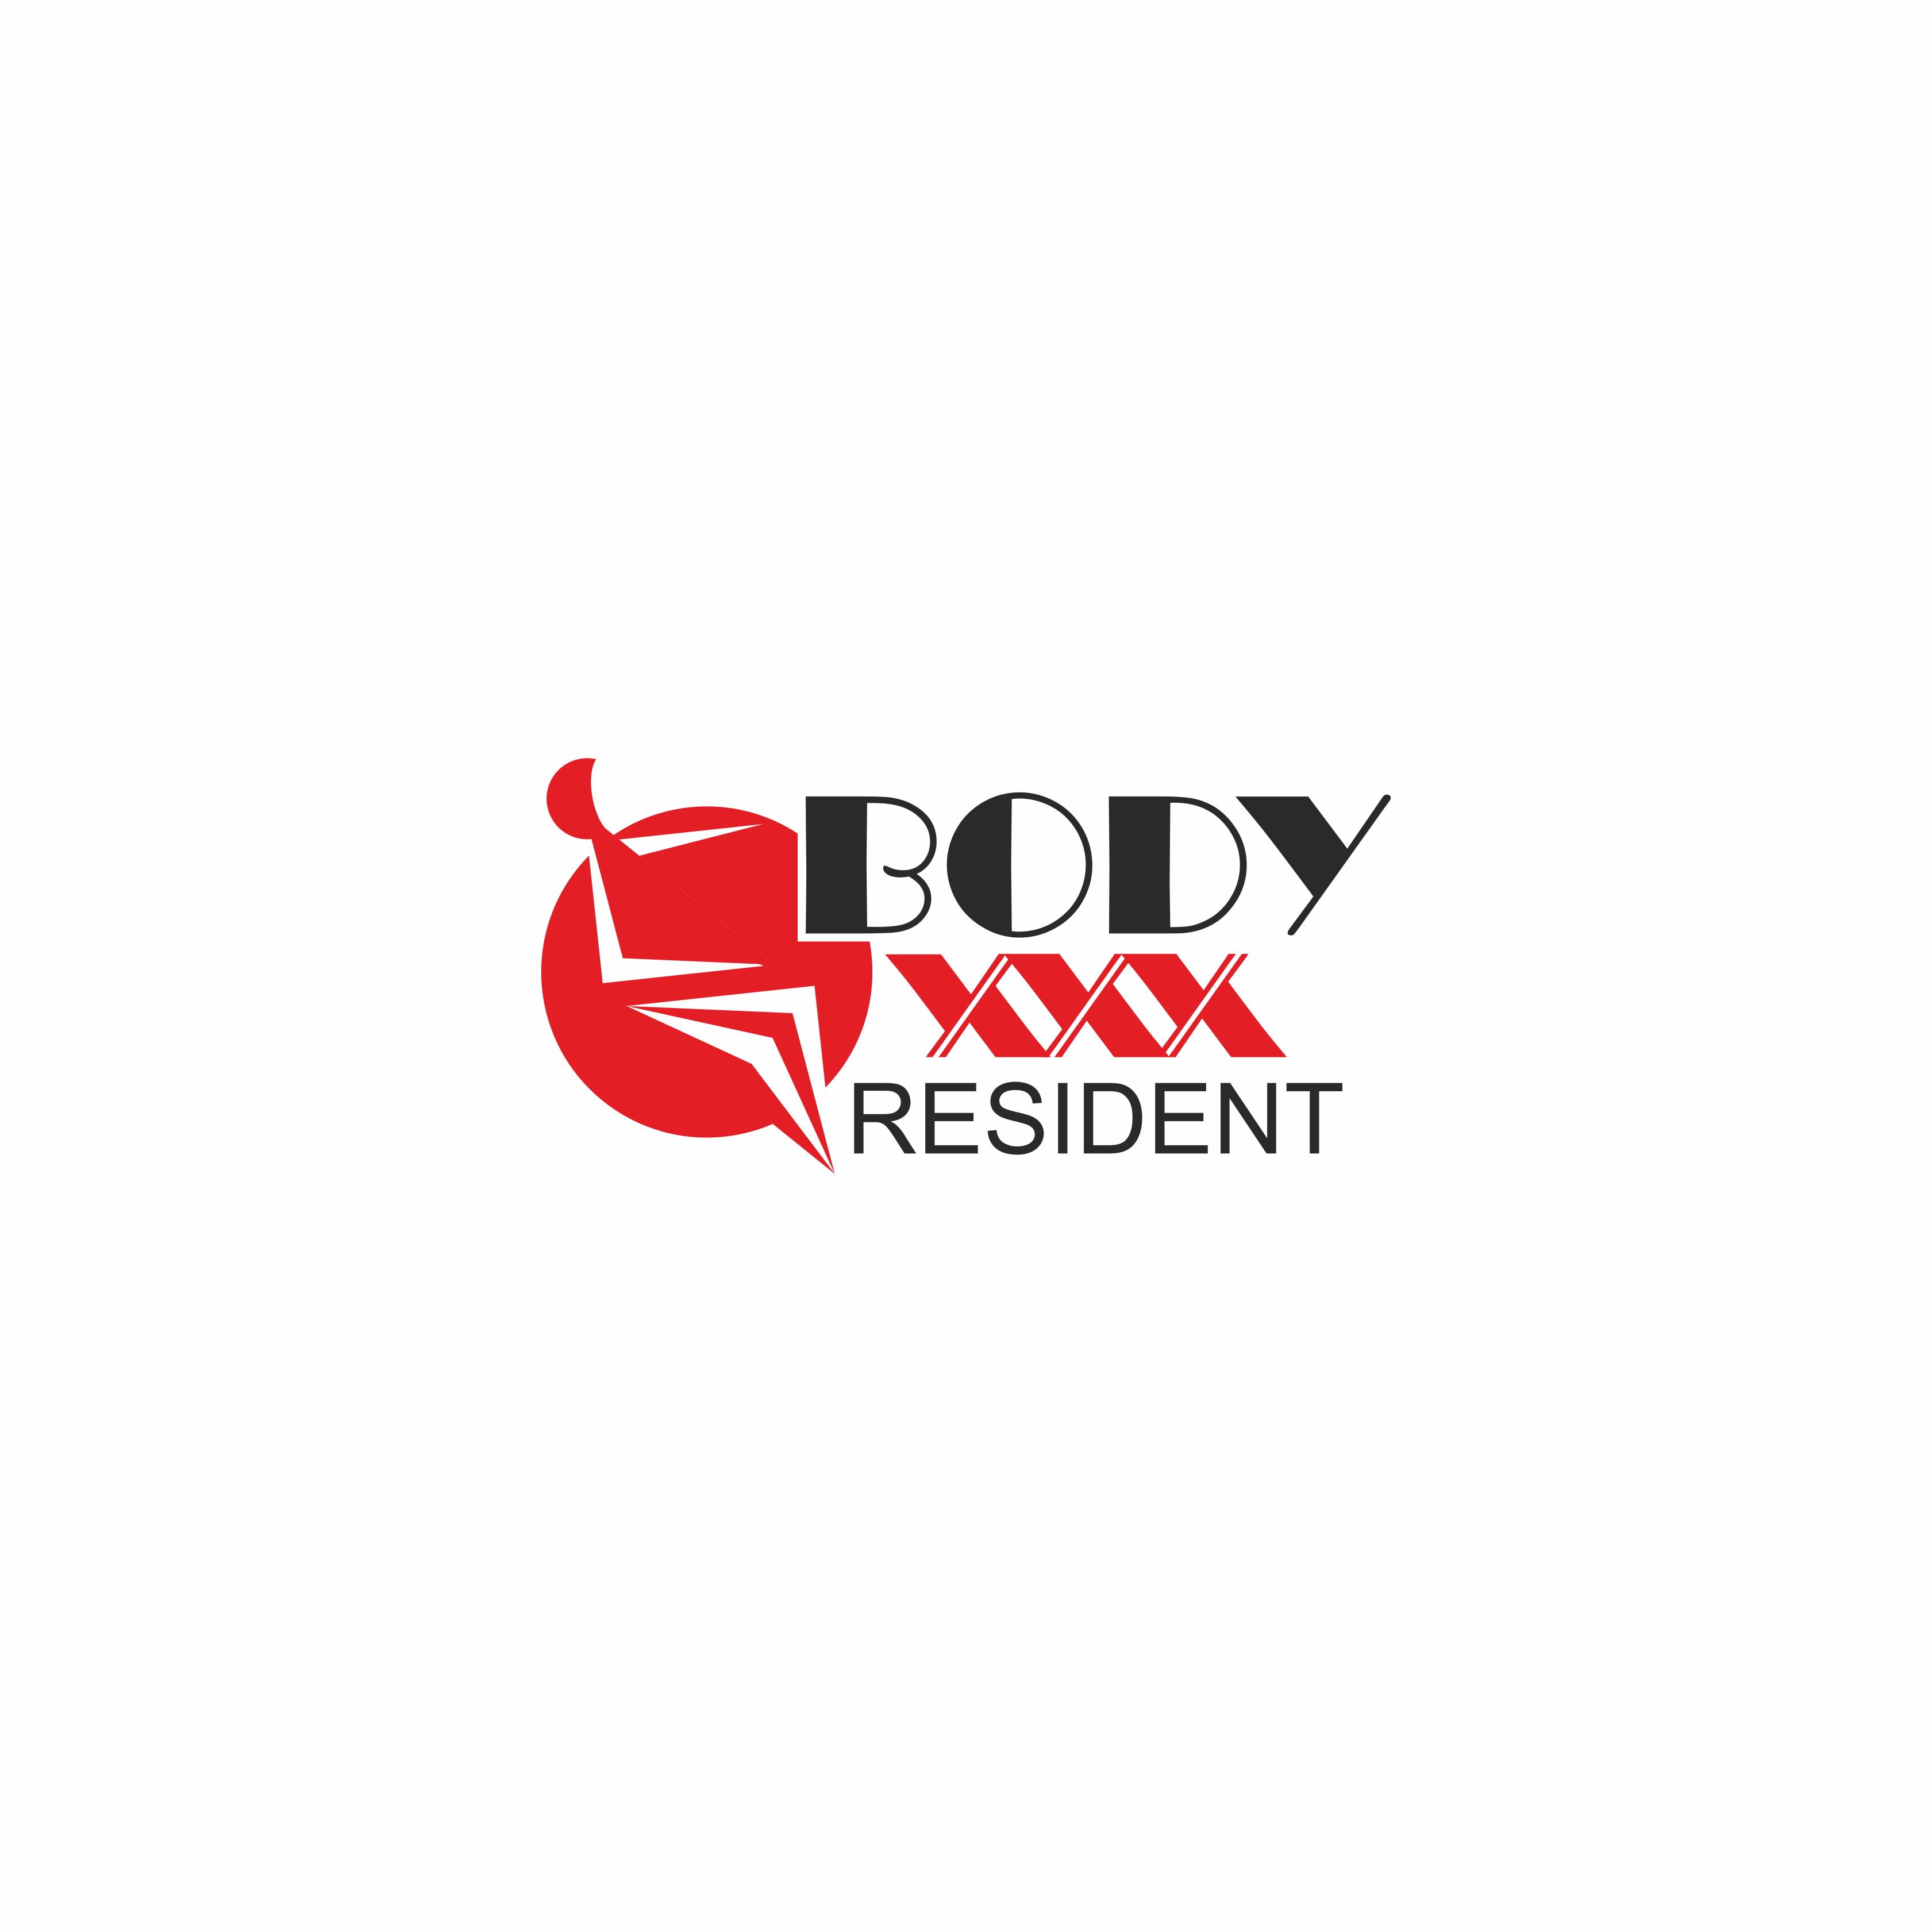 Разработка логотипа (видеоблог для моделей) фото f_0195b22846fcfe53.png